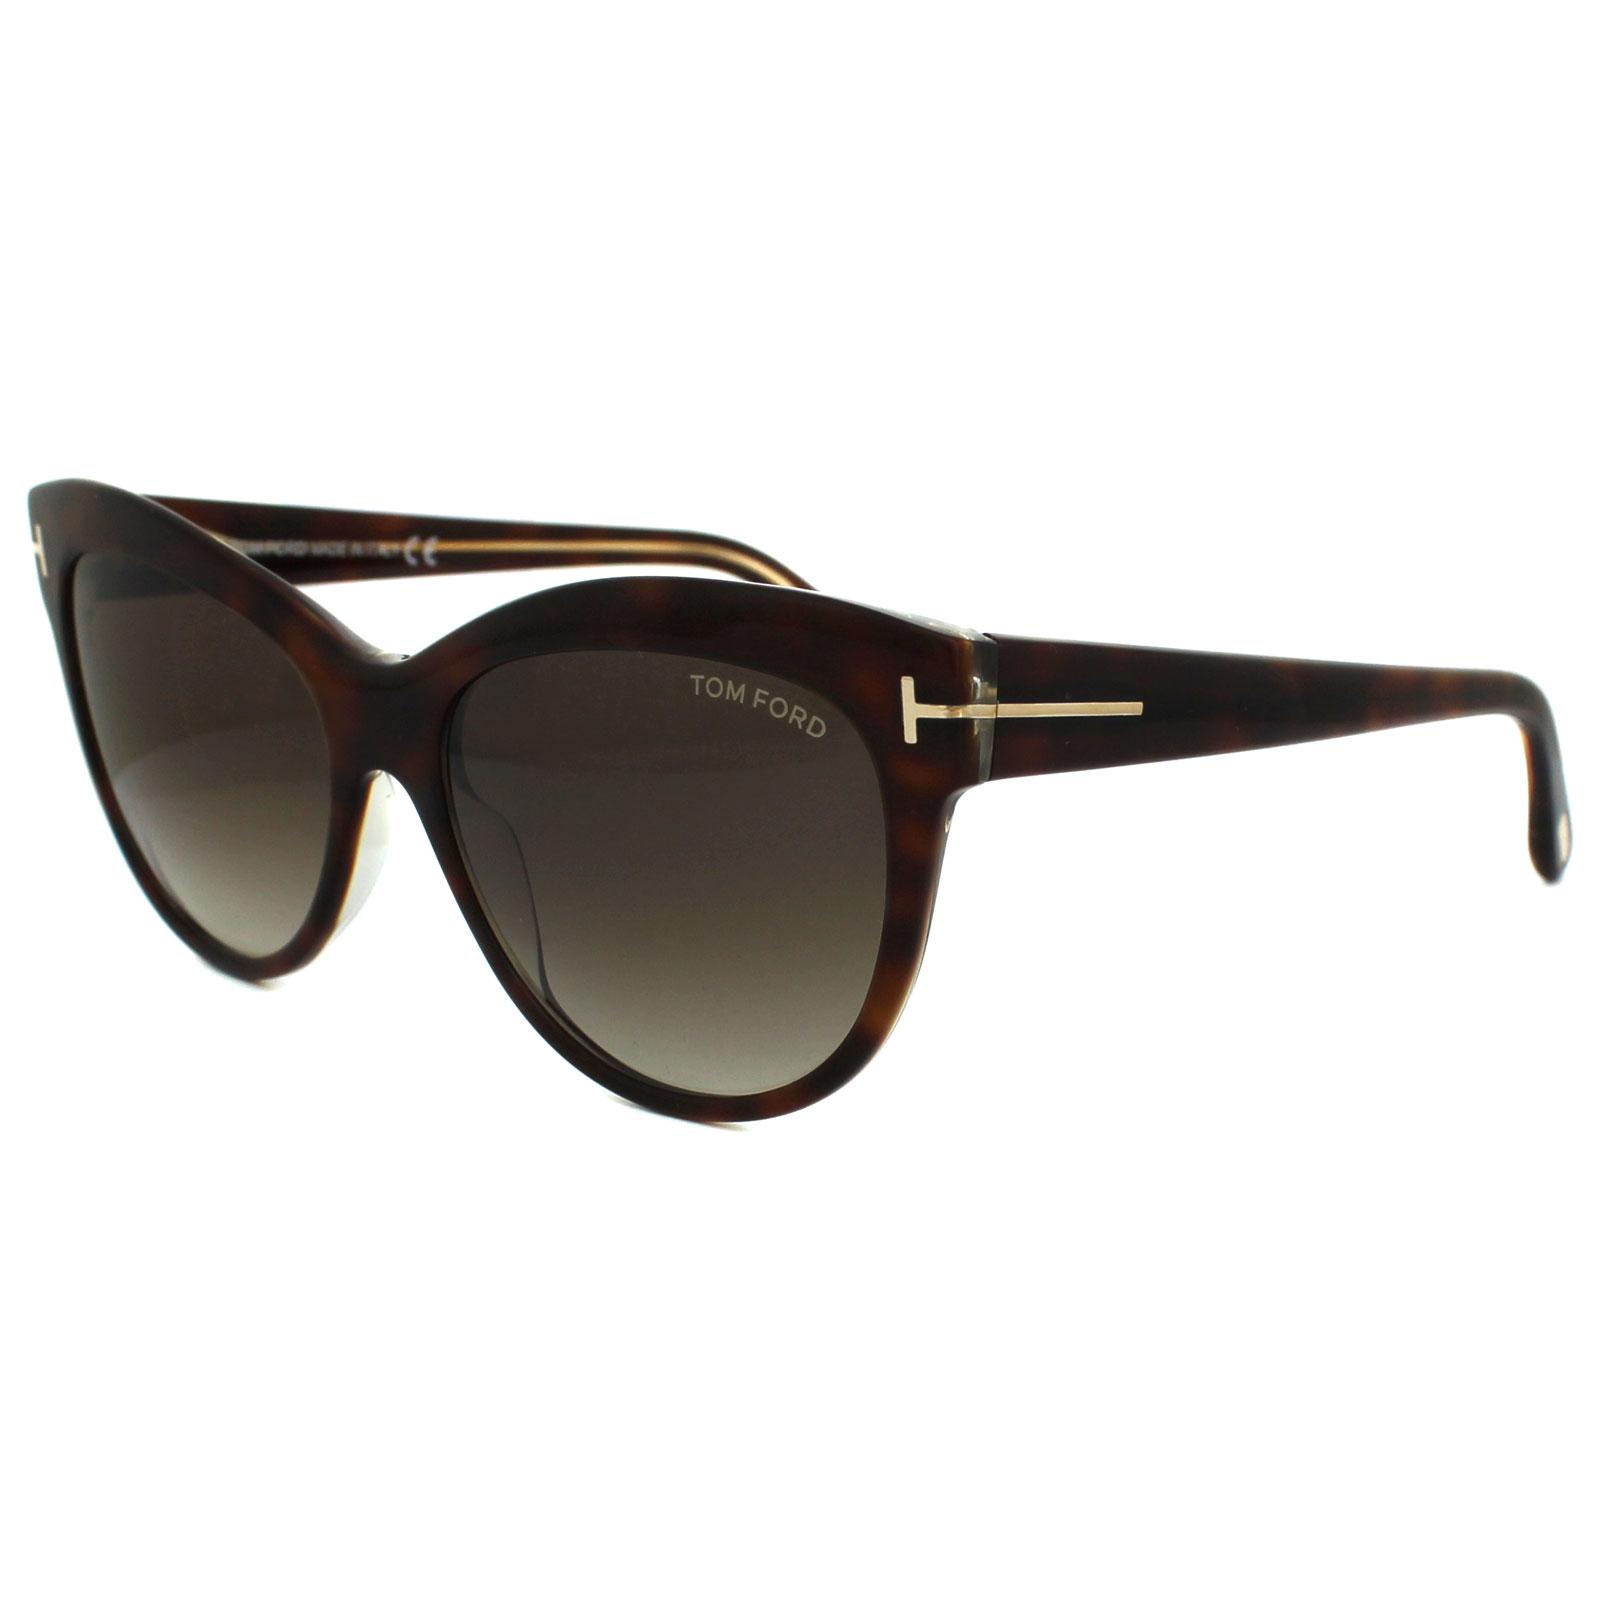 02ce787cff3d Tom Ford Sunglasses 0430 Lily 56F Havana Brown Gradient 664689717736 ...